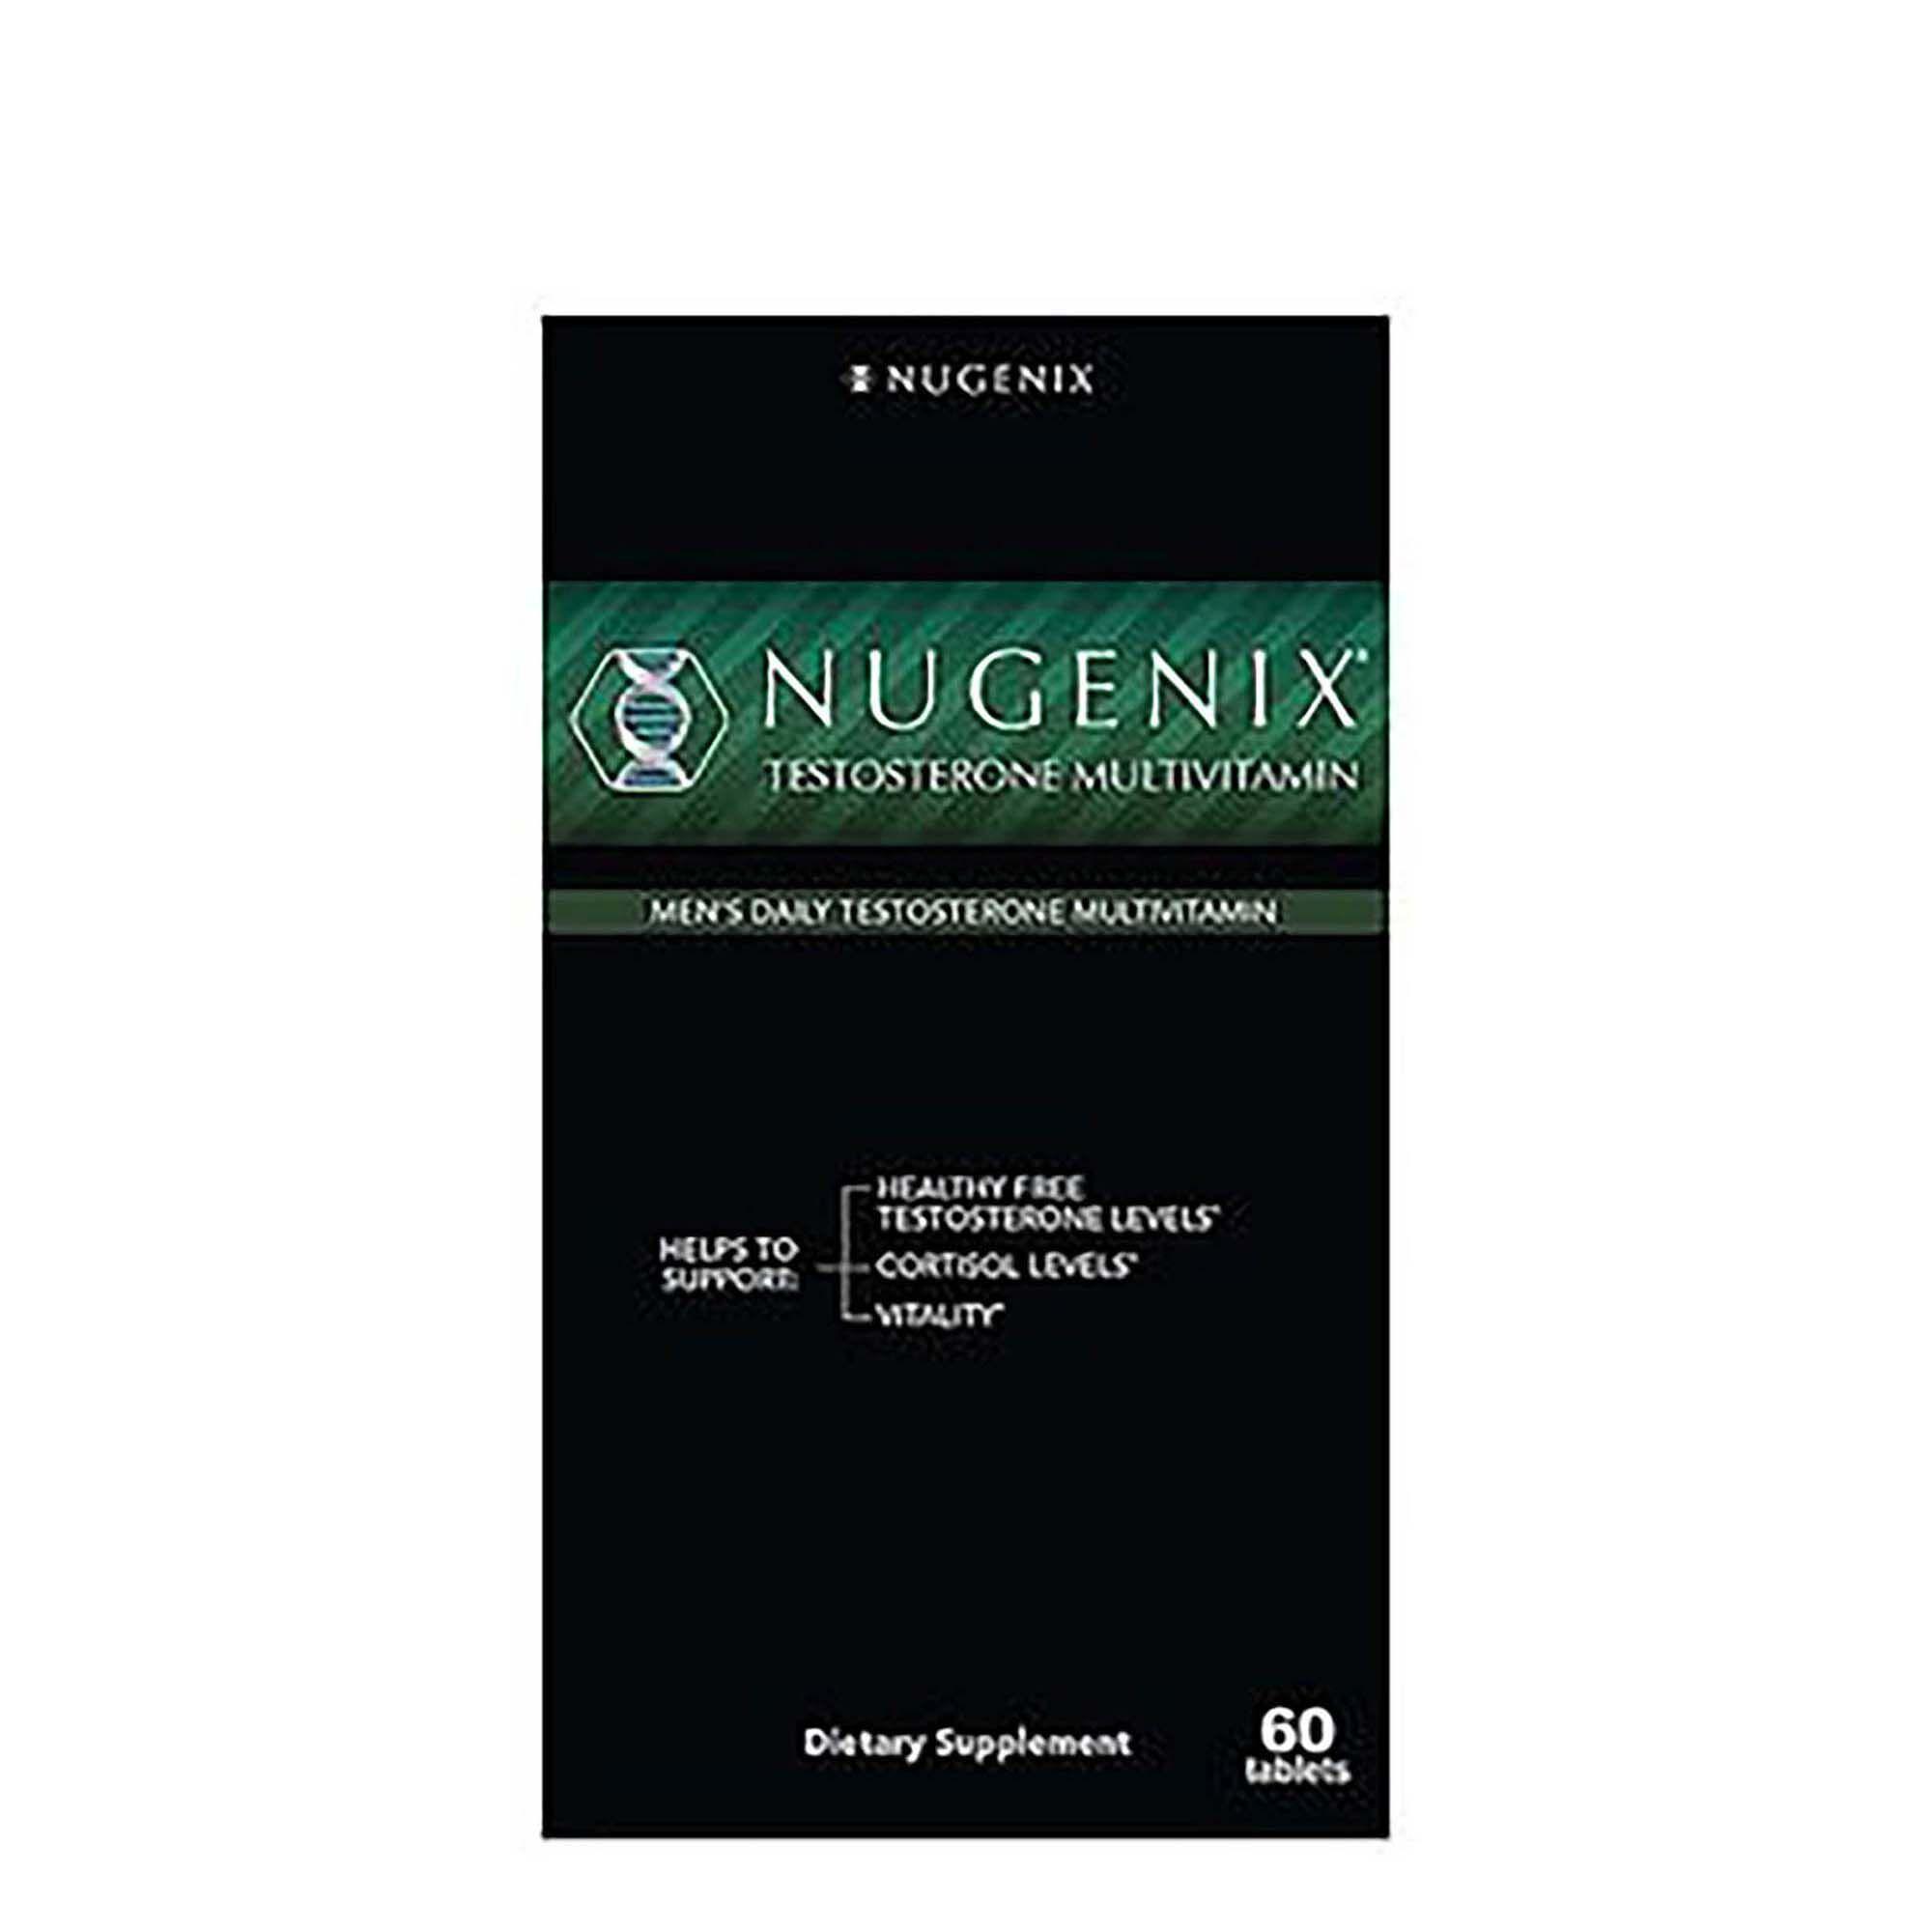 Nugenix Testosterone Multivitamin for Men Front Box